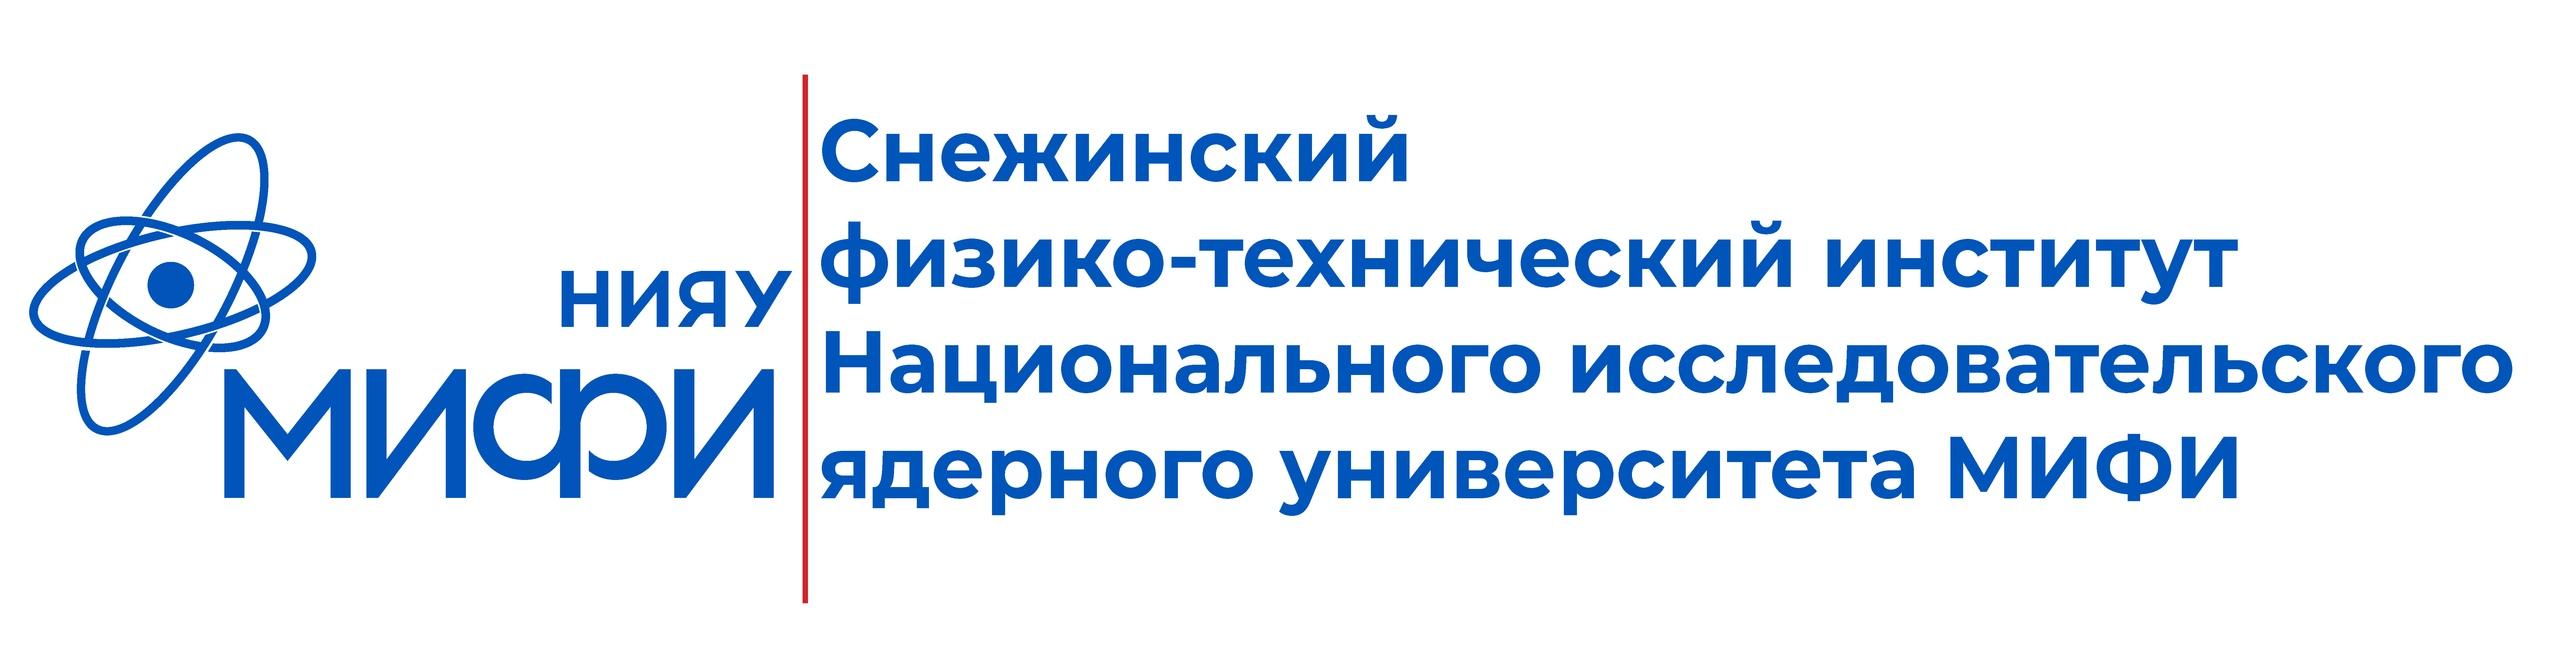 aimwC_paNb0